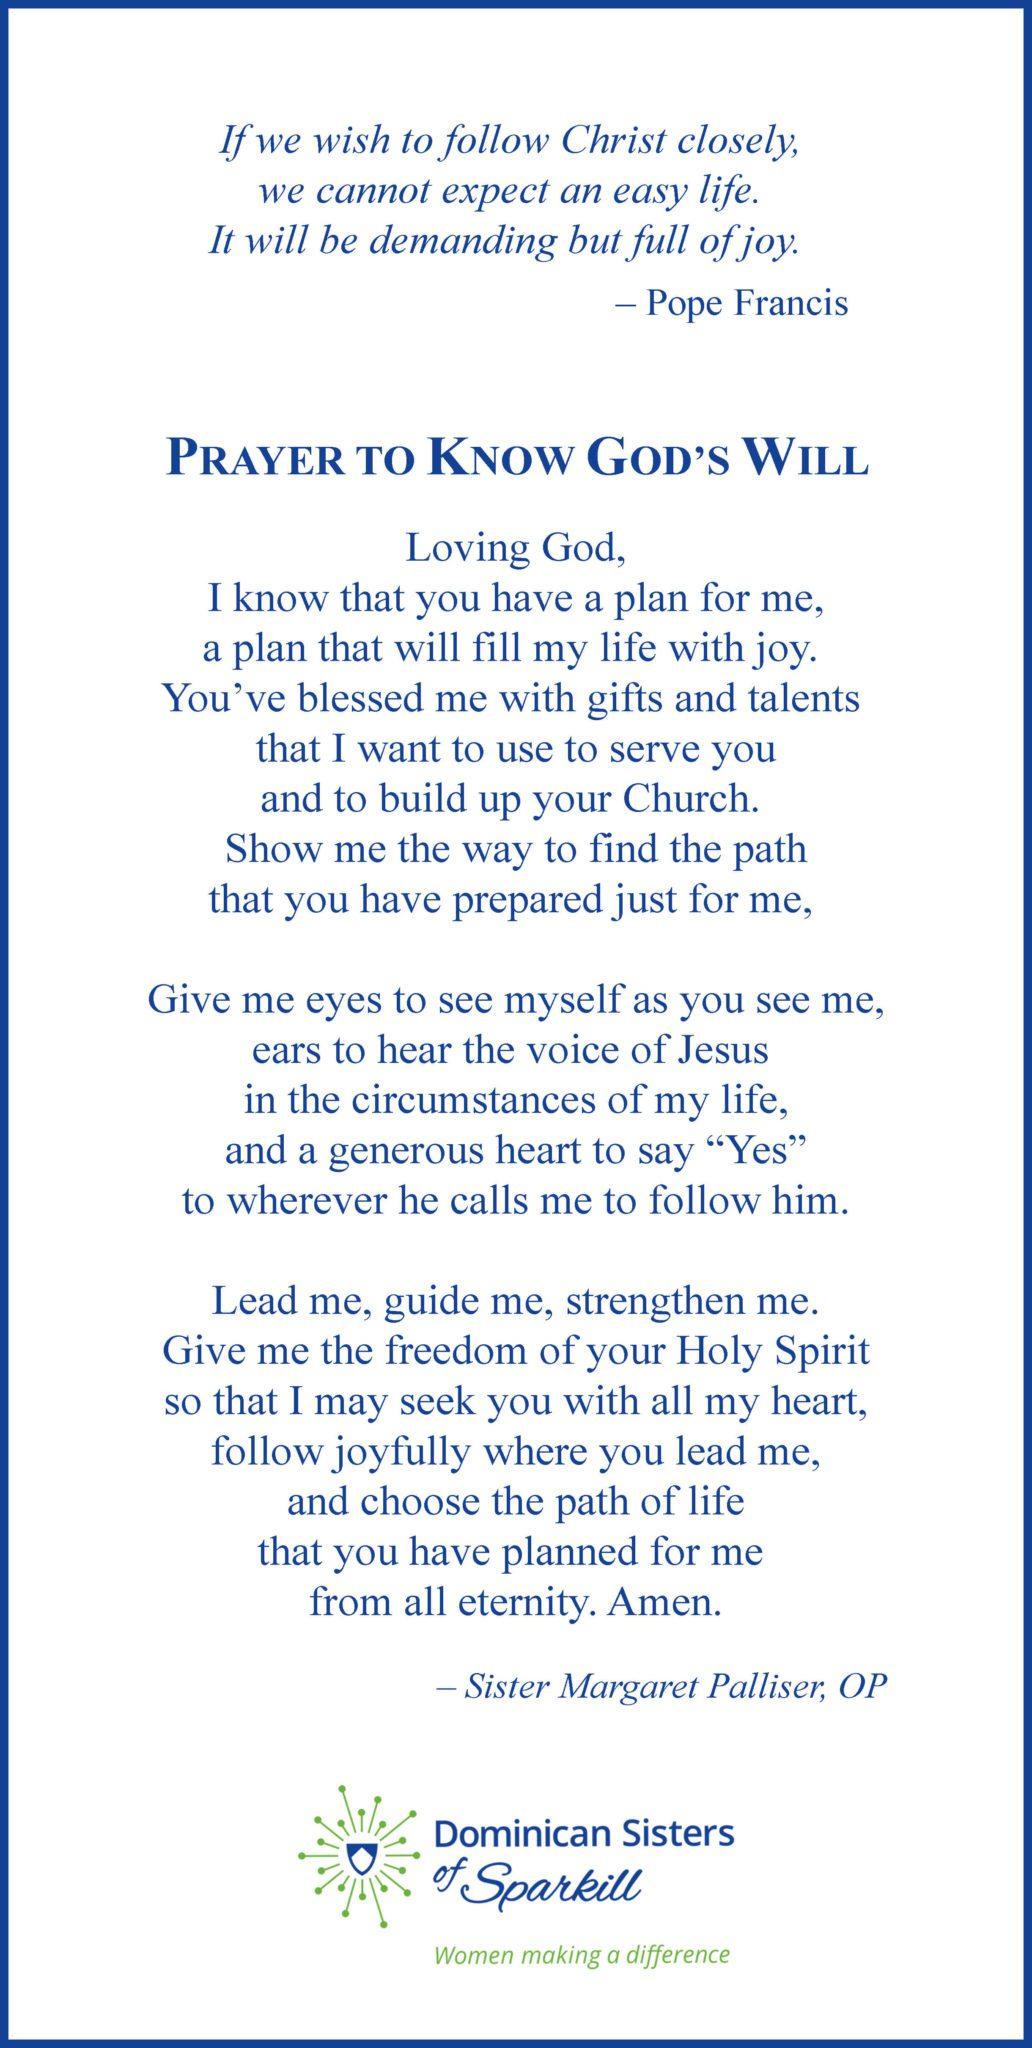 Prayer to Know God's Will